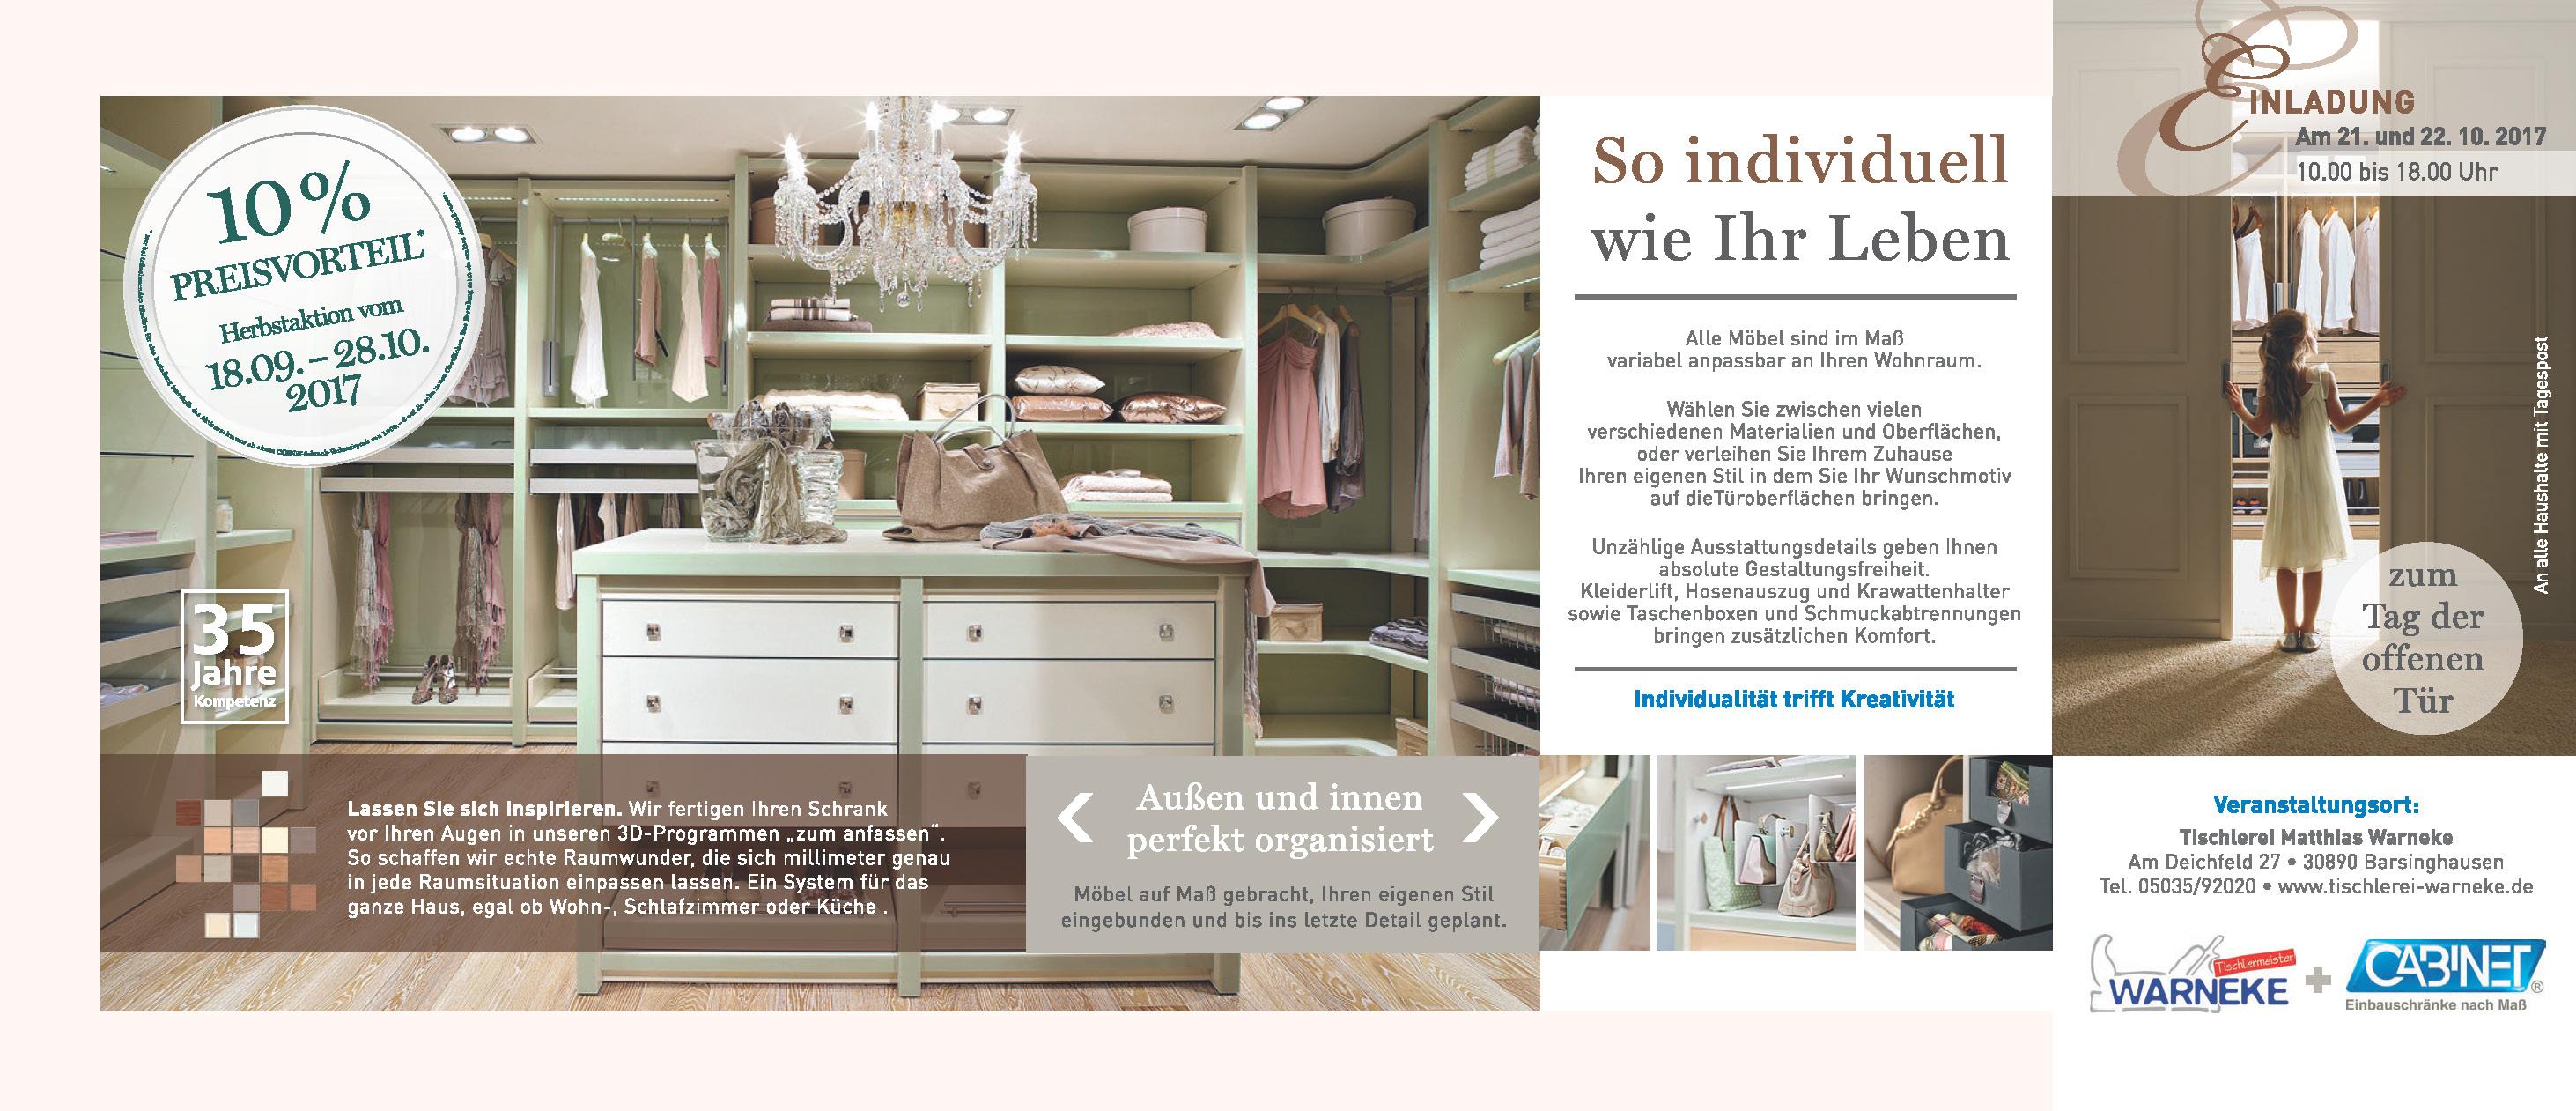 tischlerei matthias warneke barsinghausen tischlerei matthias warneke m bel nach ma. Black Bedroom Furniture Sets. Home Design Ideas